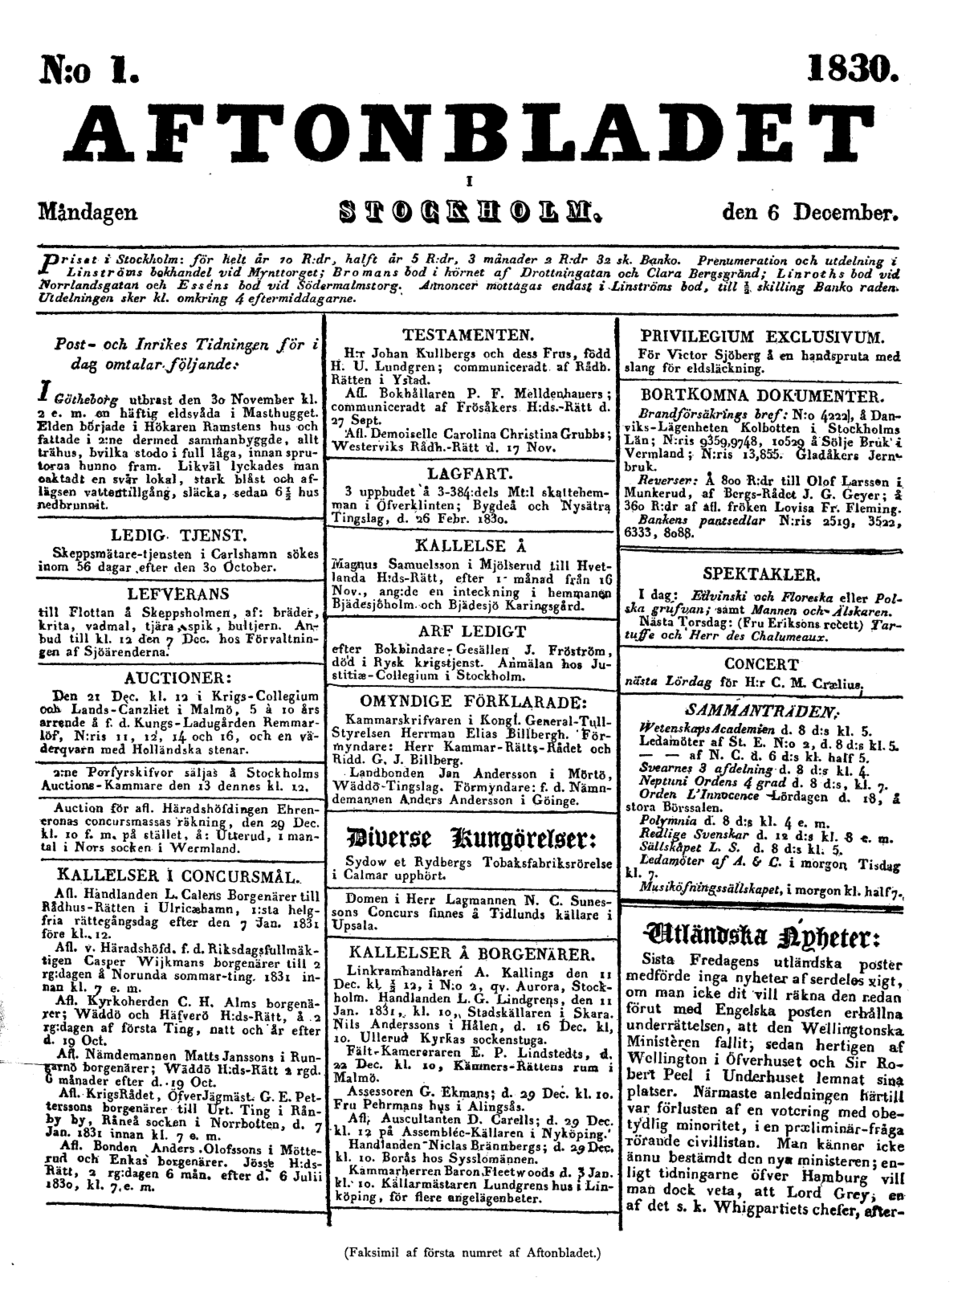 Aftonbladet no1 1830-12-06